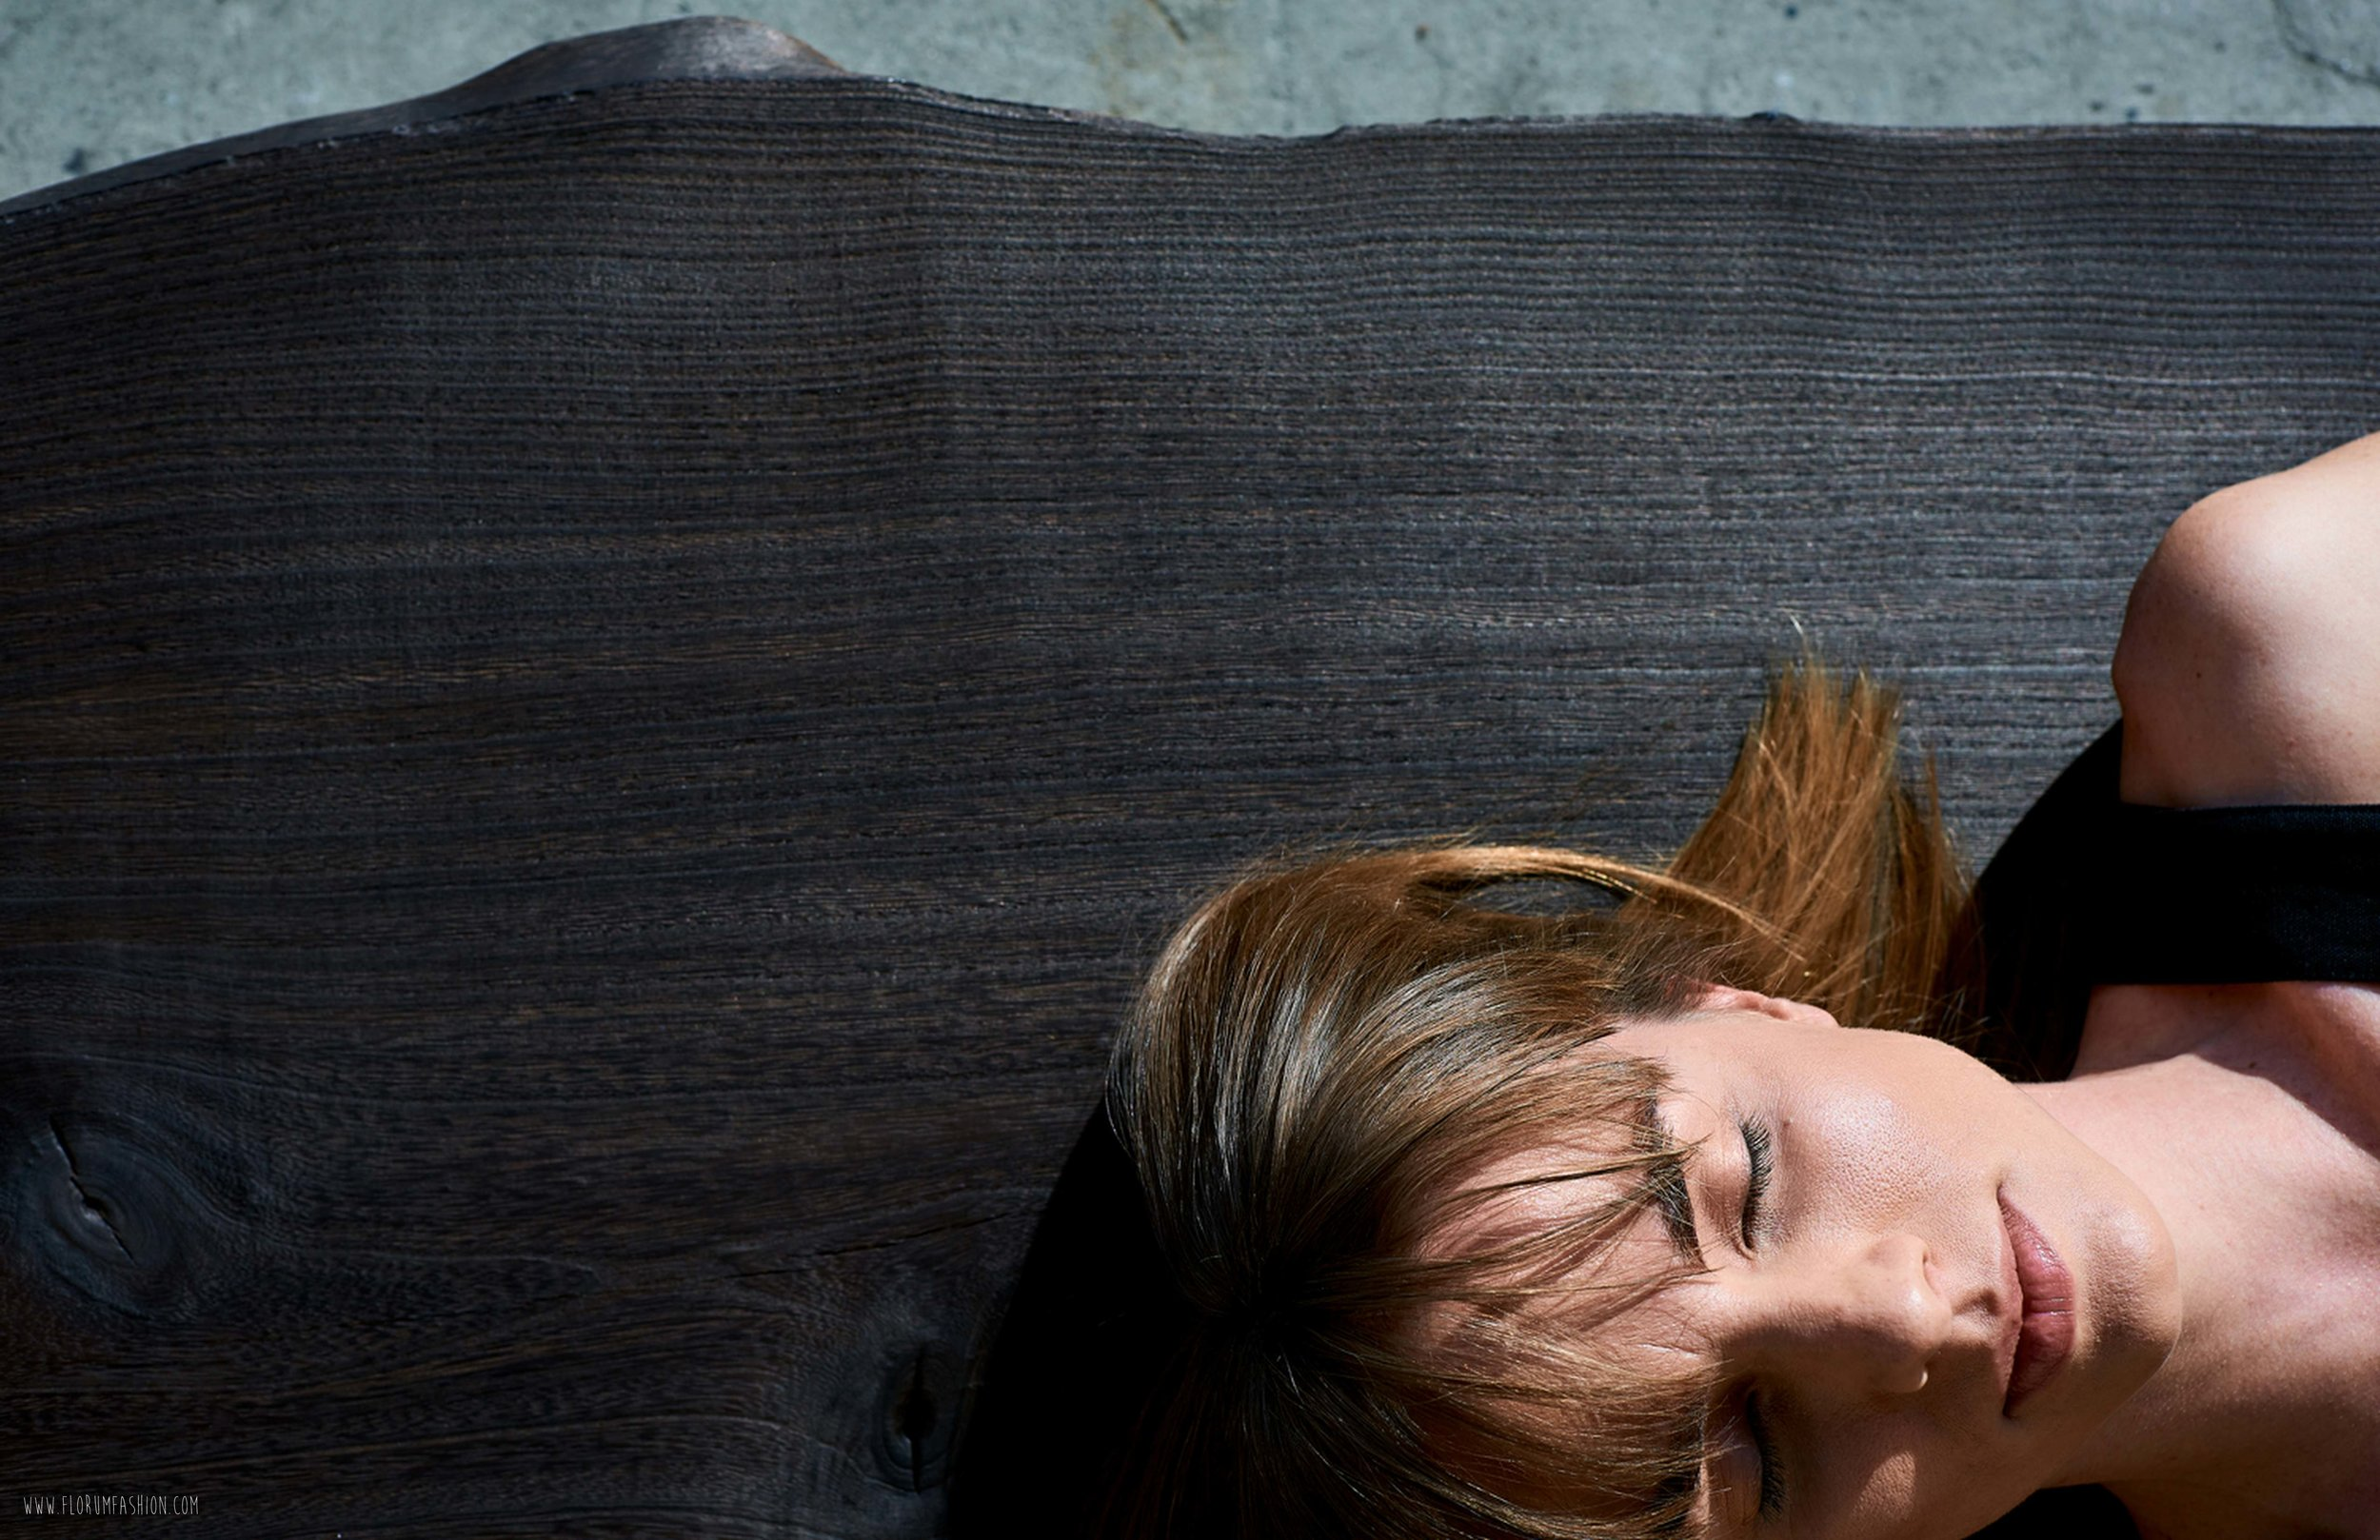 Made in LA - Echo and Air x Stranger Furniture - Ethical Sustainable repurposed - Florum Fashion Magazine - Fash Revolution - Brendan Rowe - Amber Marie Bollinger - Ever Velasquez - designer Jordana Howard - Webitorial